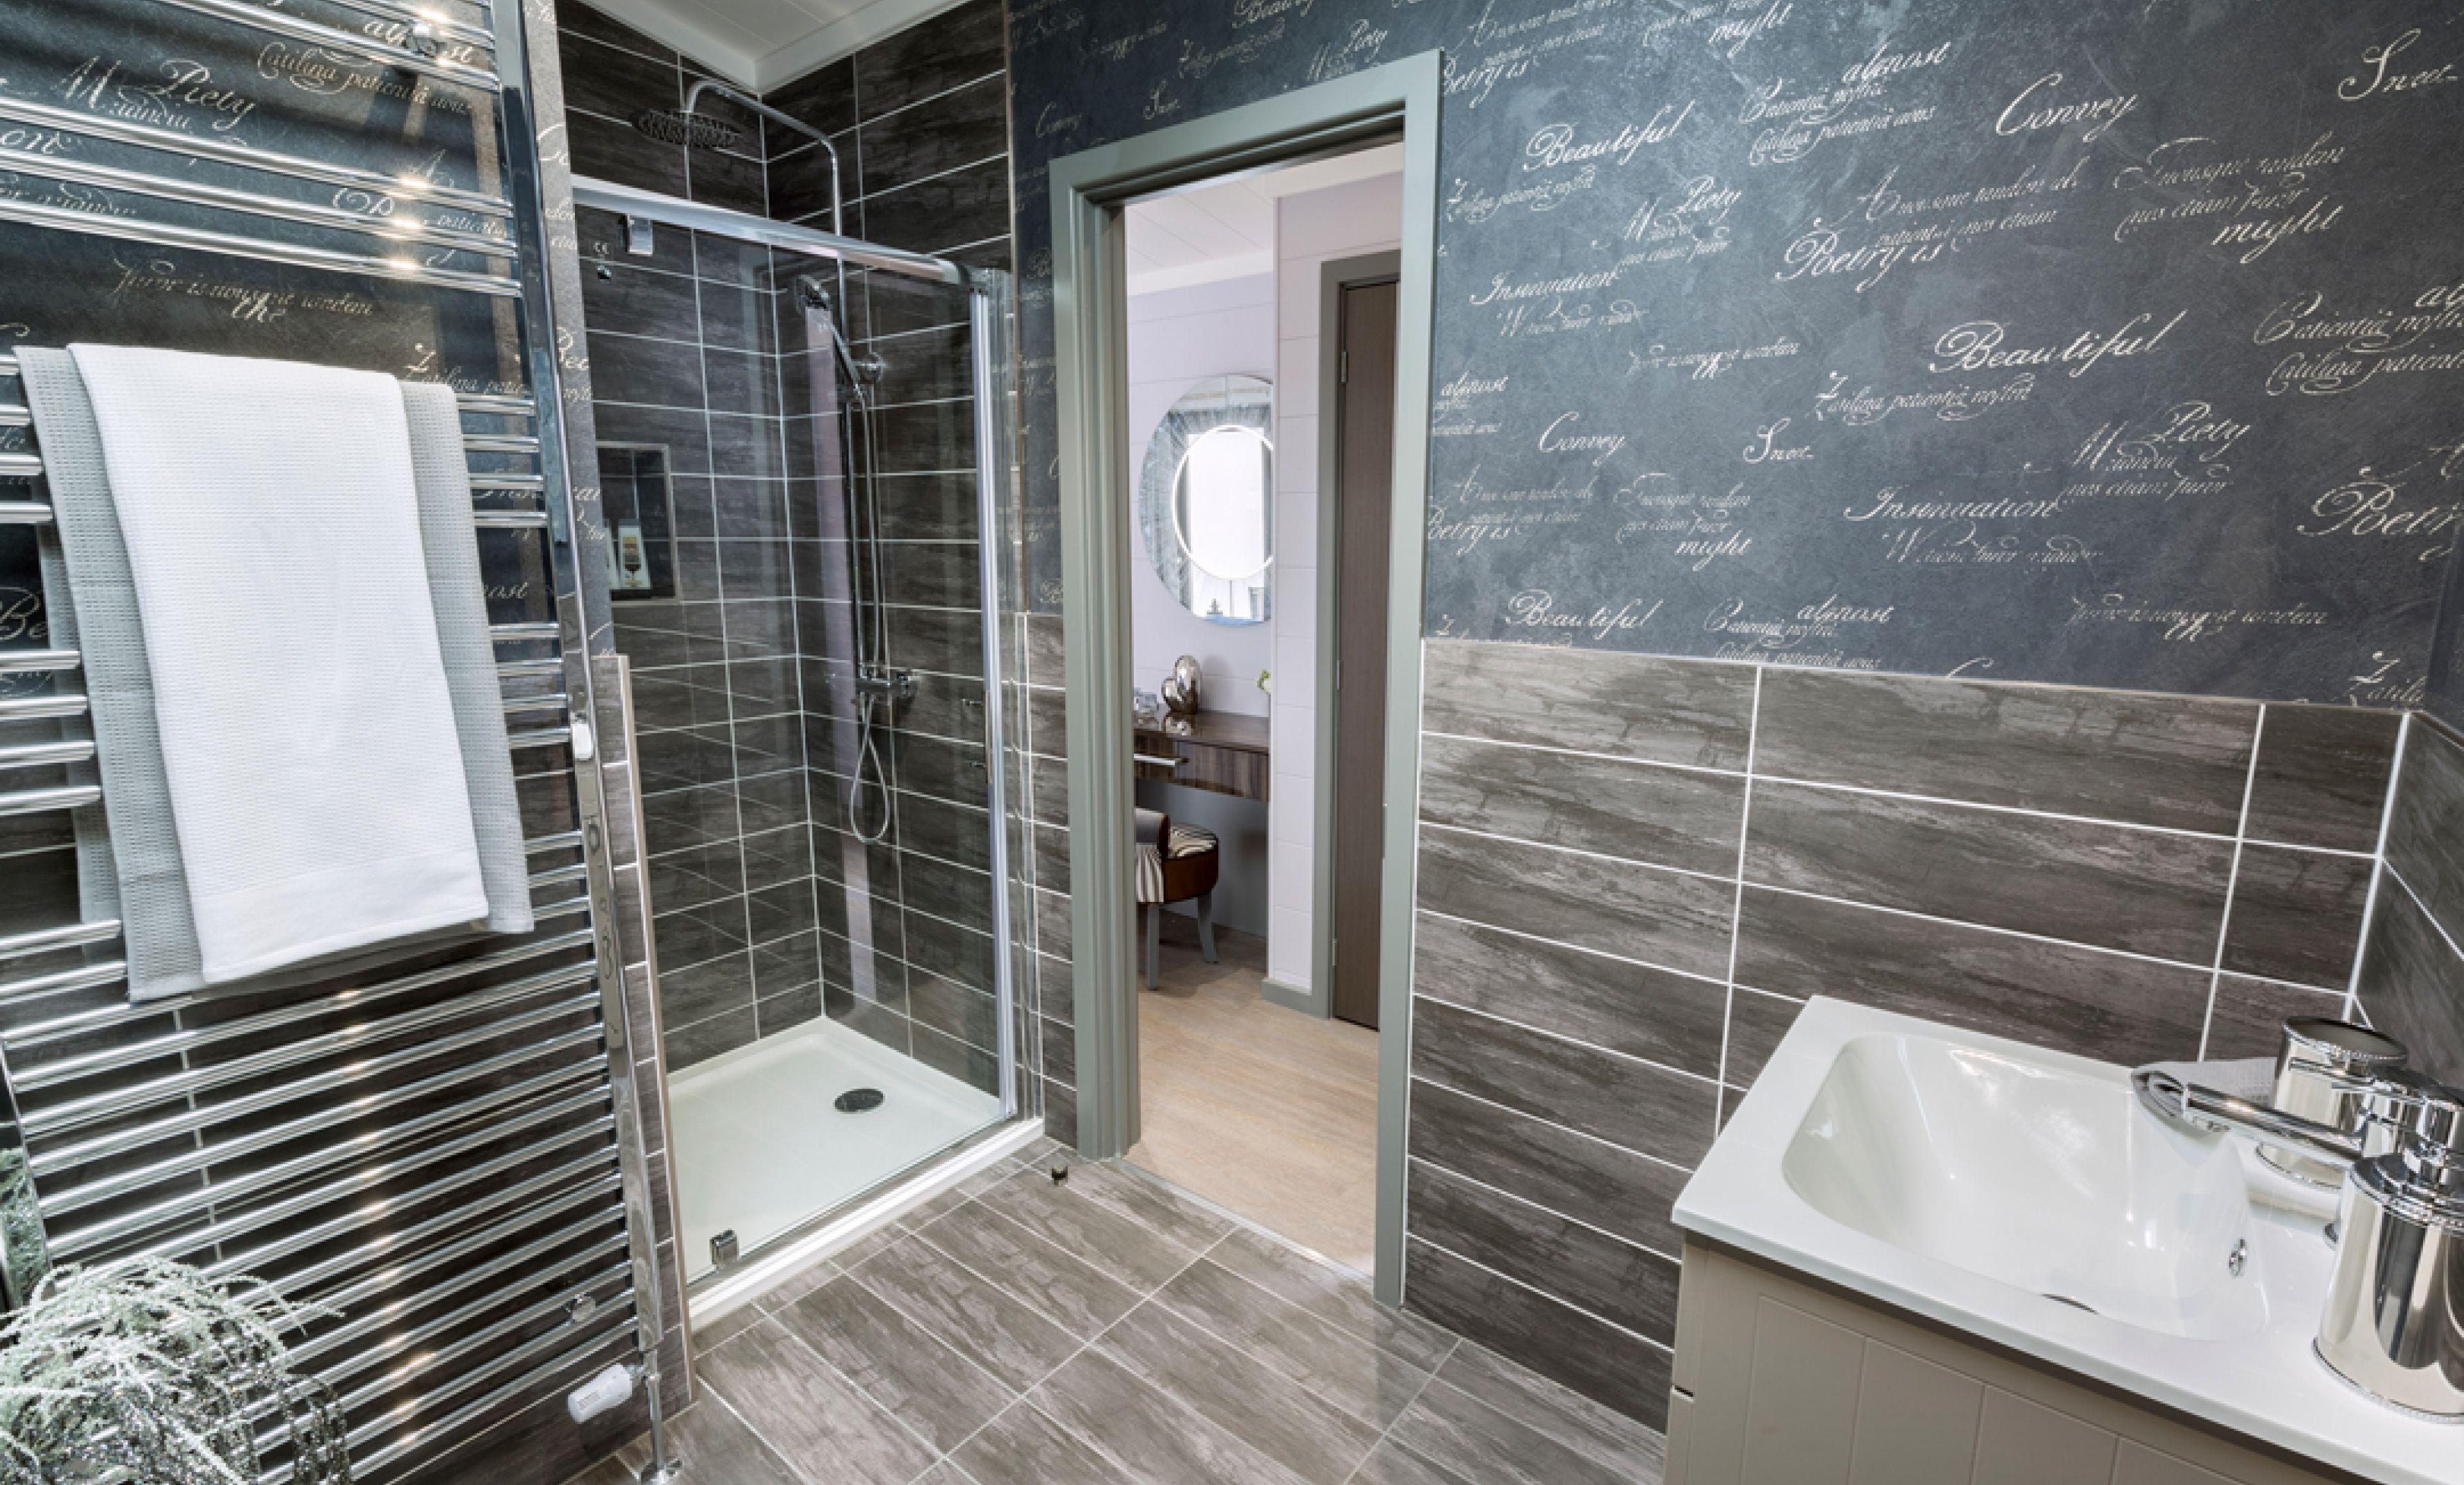 The Kudos bathroom